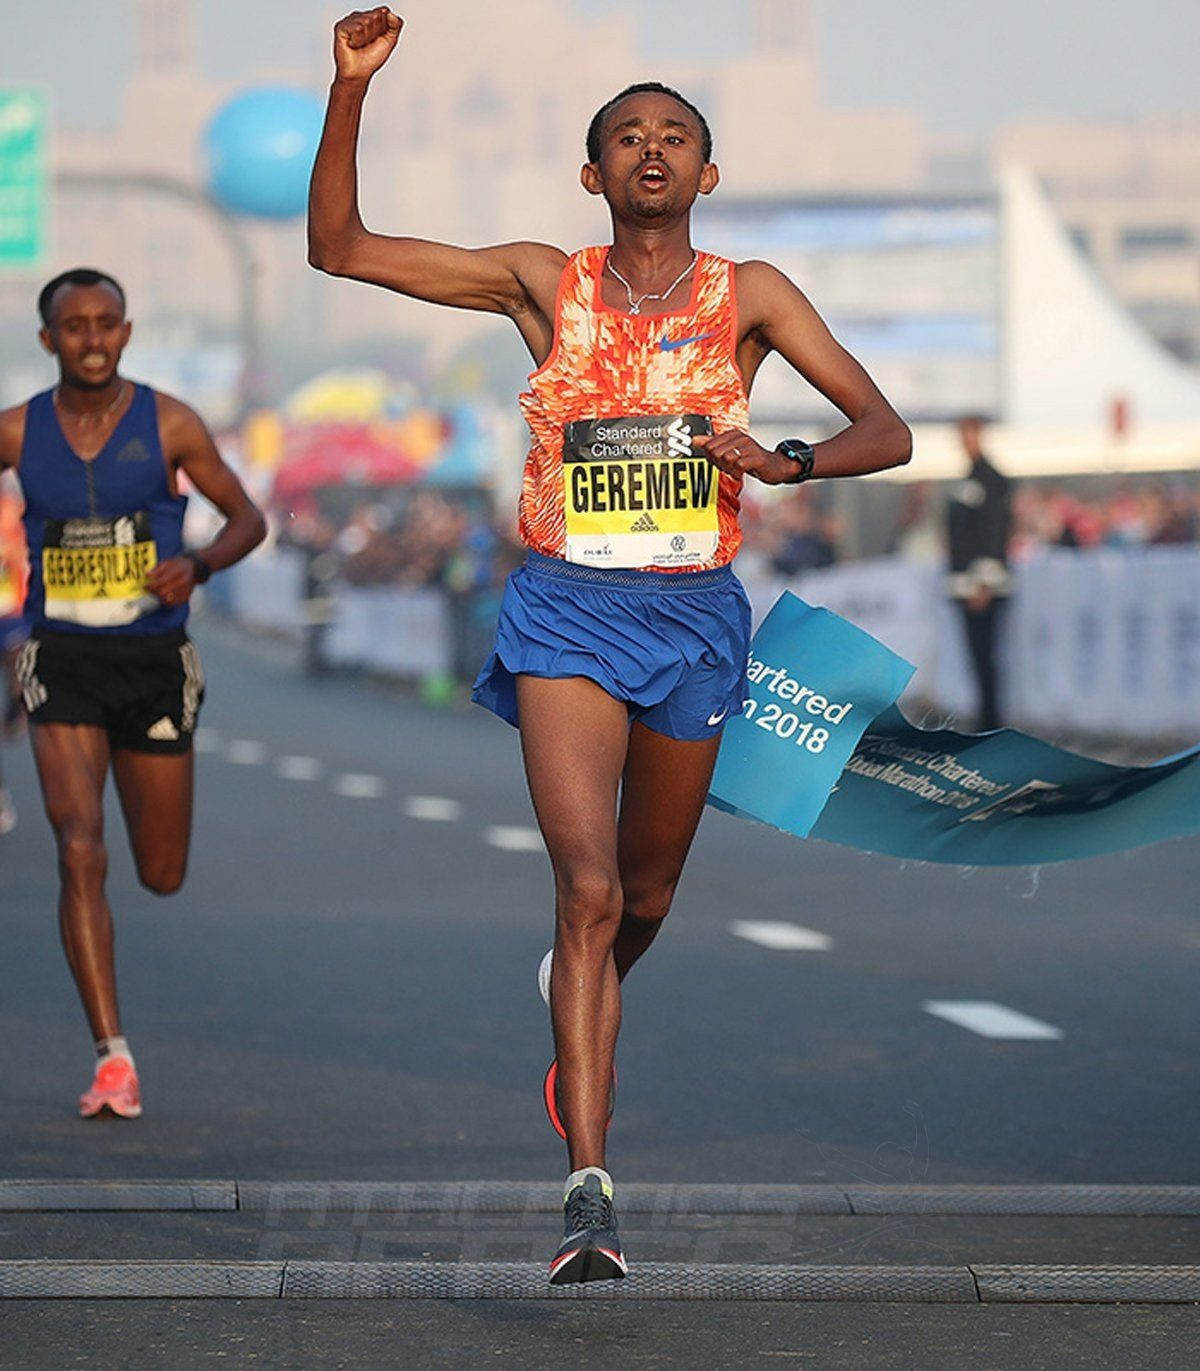 Ethiopia's Mosinet Geremew breaking the course record to take the men's title at the 2018 Standard Chartered Dubai Marathon / Photo Credit: Dubai Marathon Office